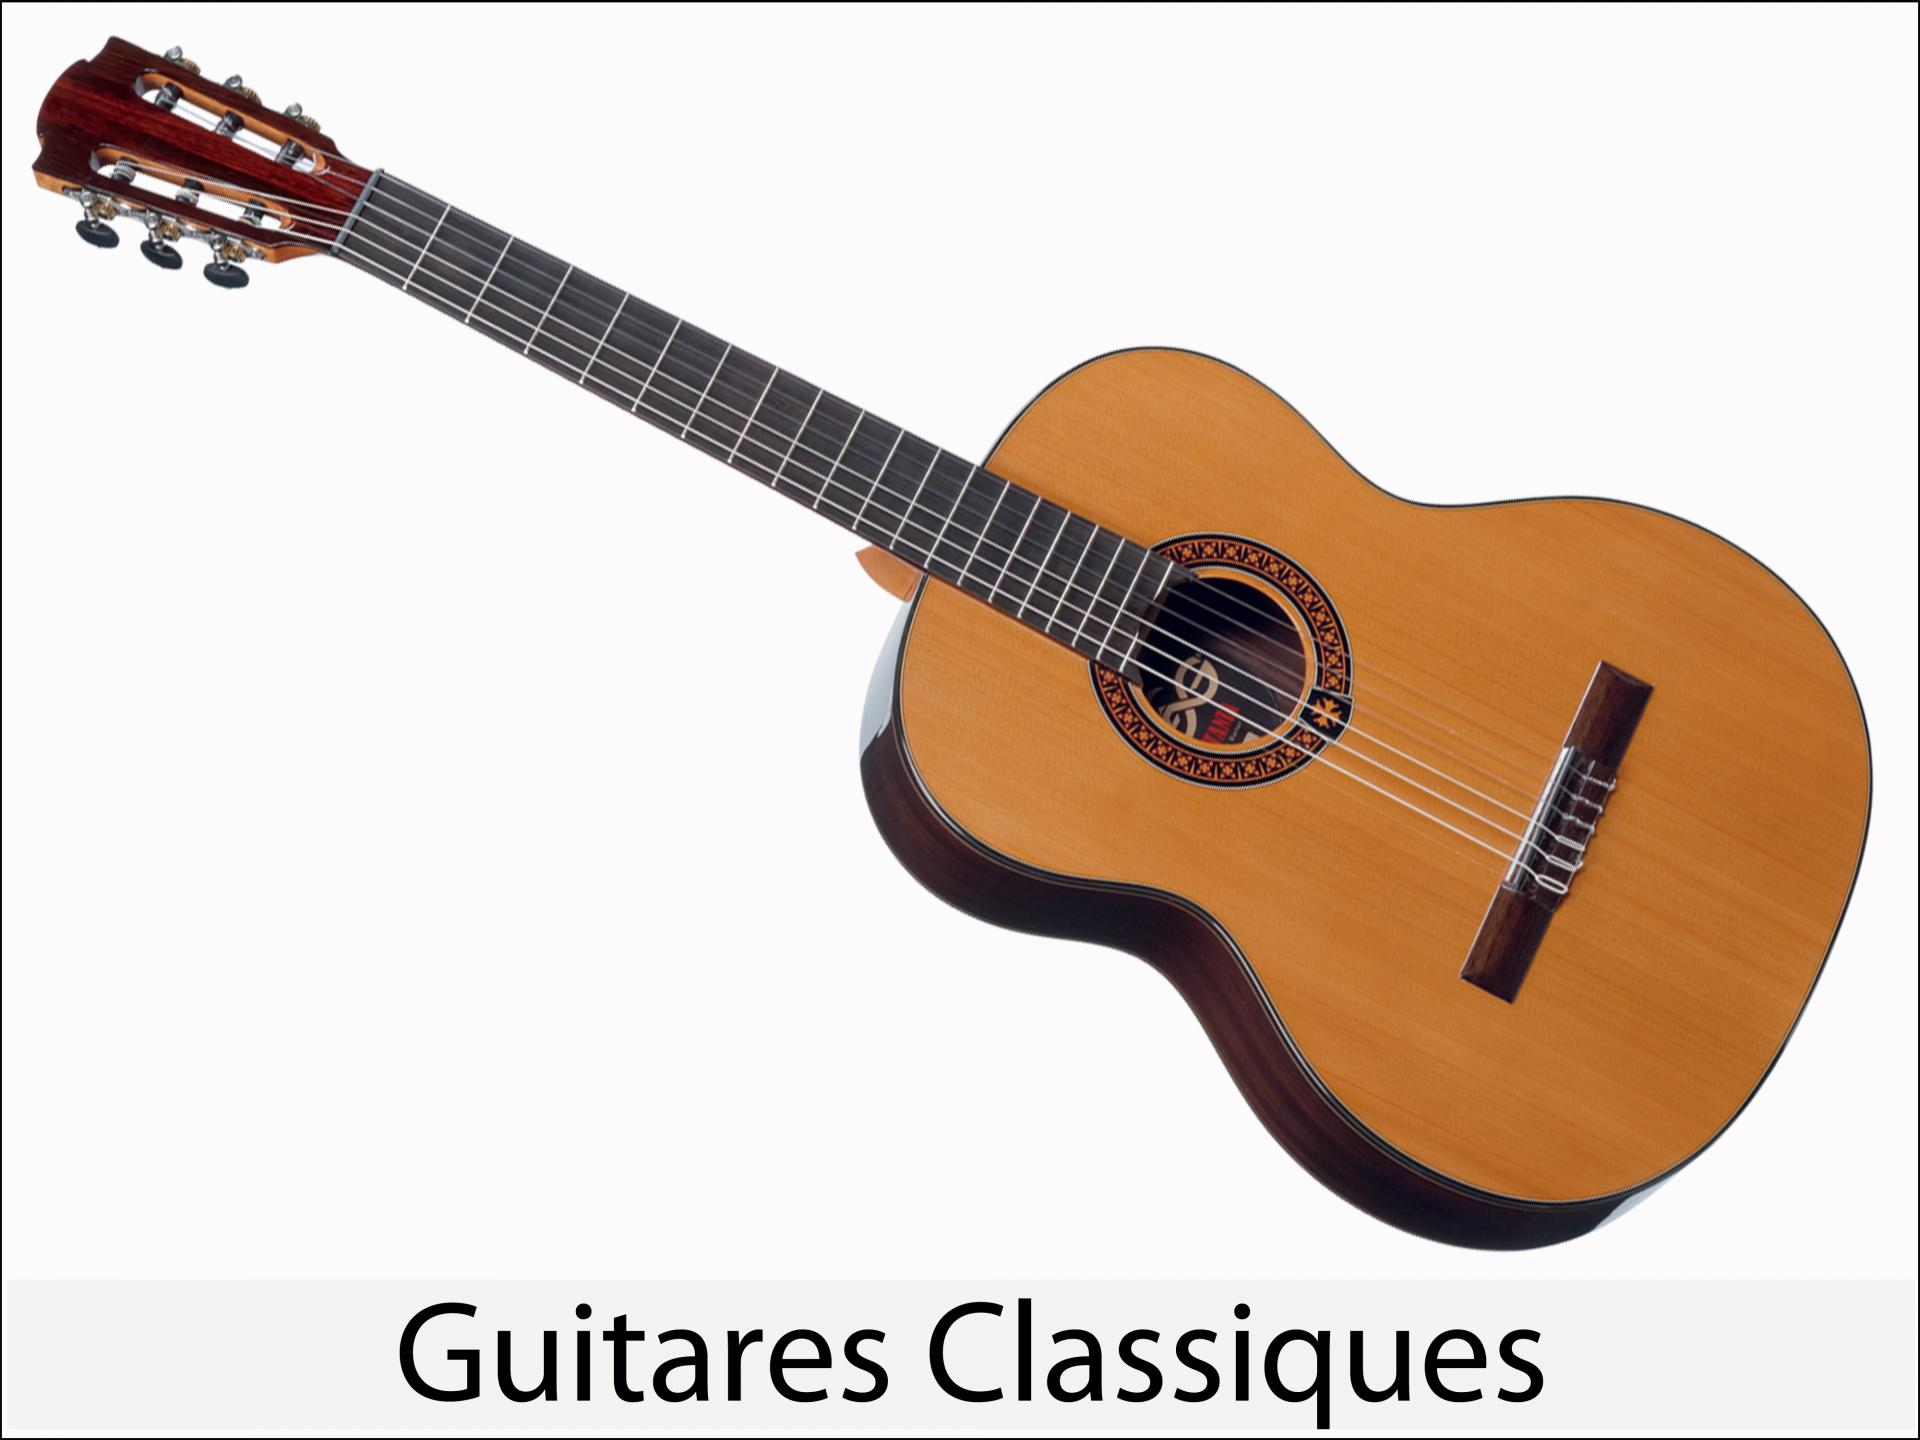 Acceuil carre guitares classiques